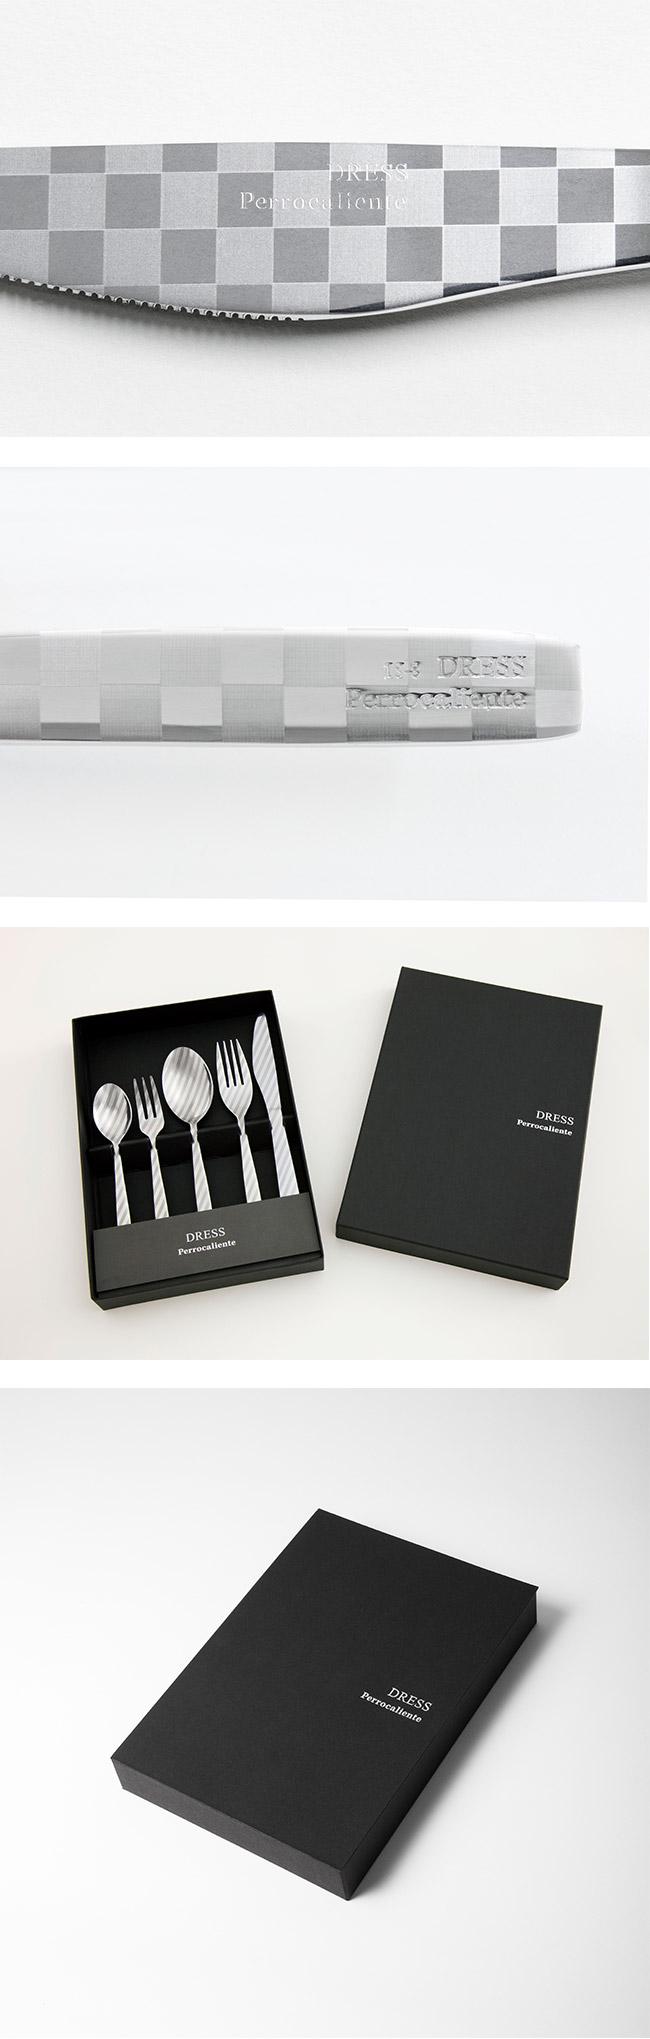 Perrocaliente Dress Gift Set 銀色盒裝餐具組 兩對組 棋盤格 (湯匙*2+叉子*2)